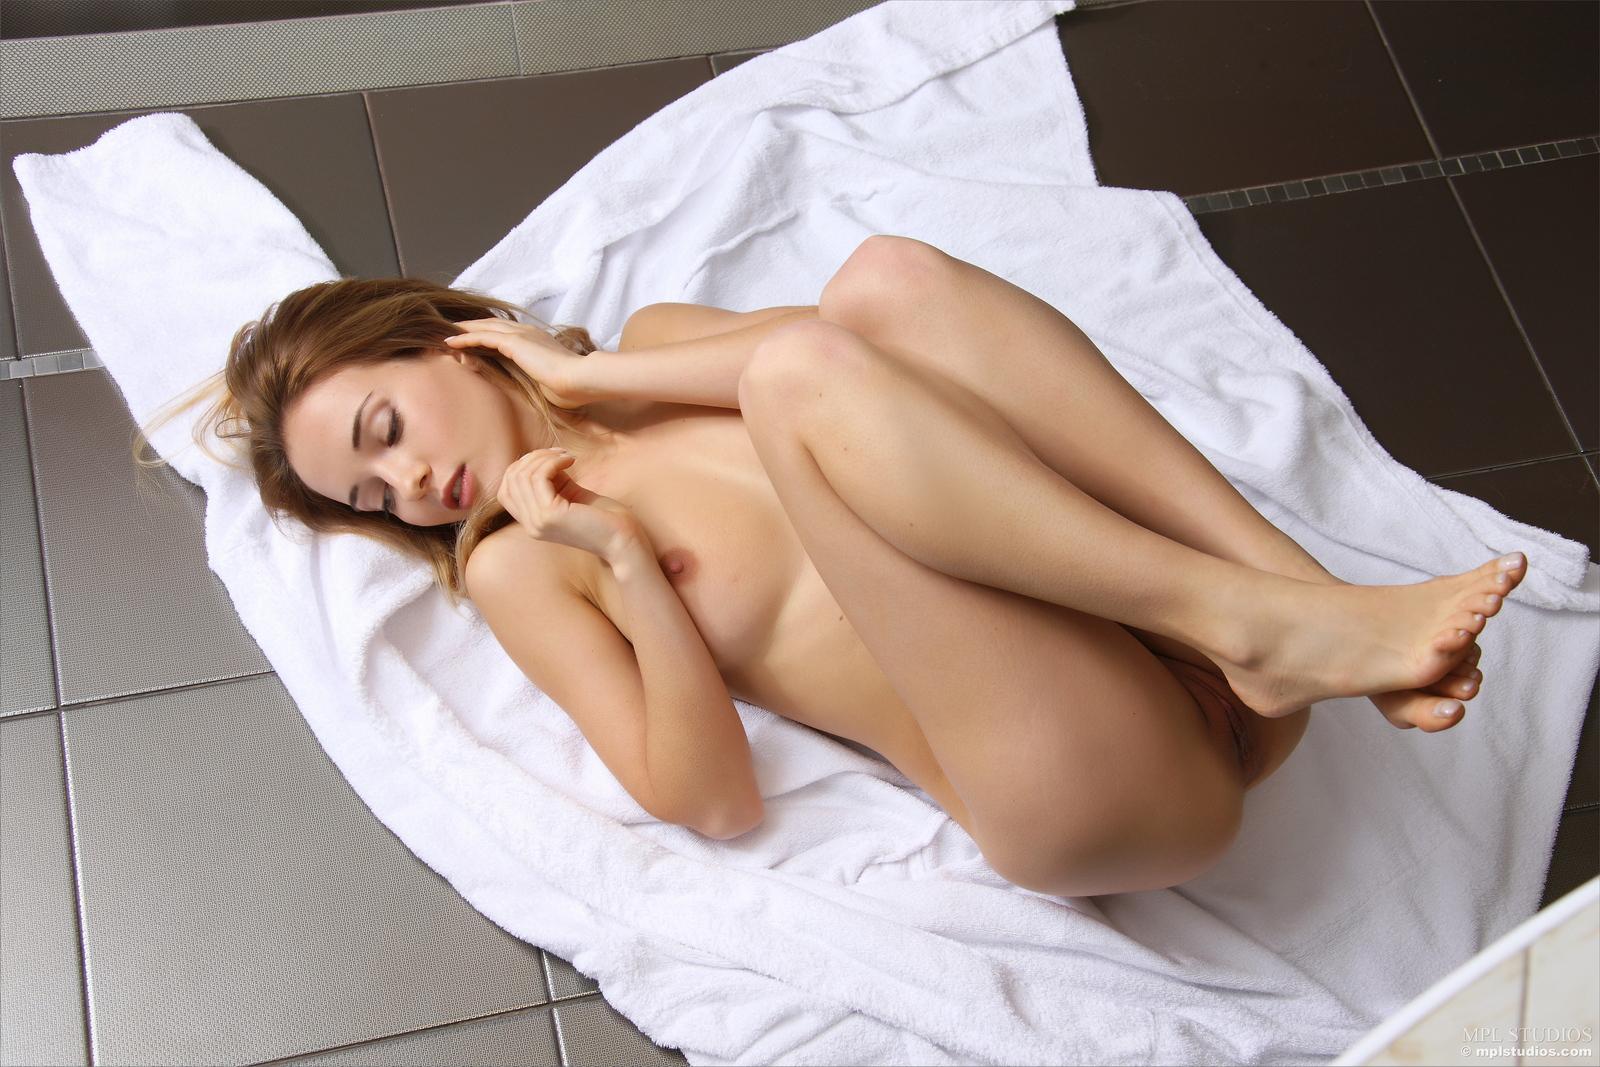 danica-bathroom-blonde-dressing-gown-naked-mplstudios-31